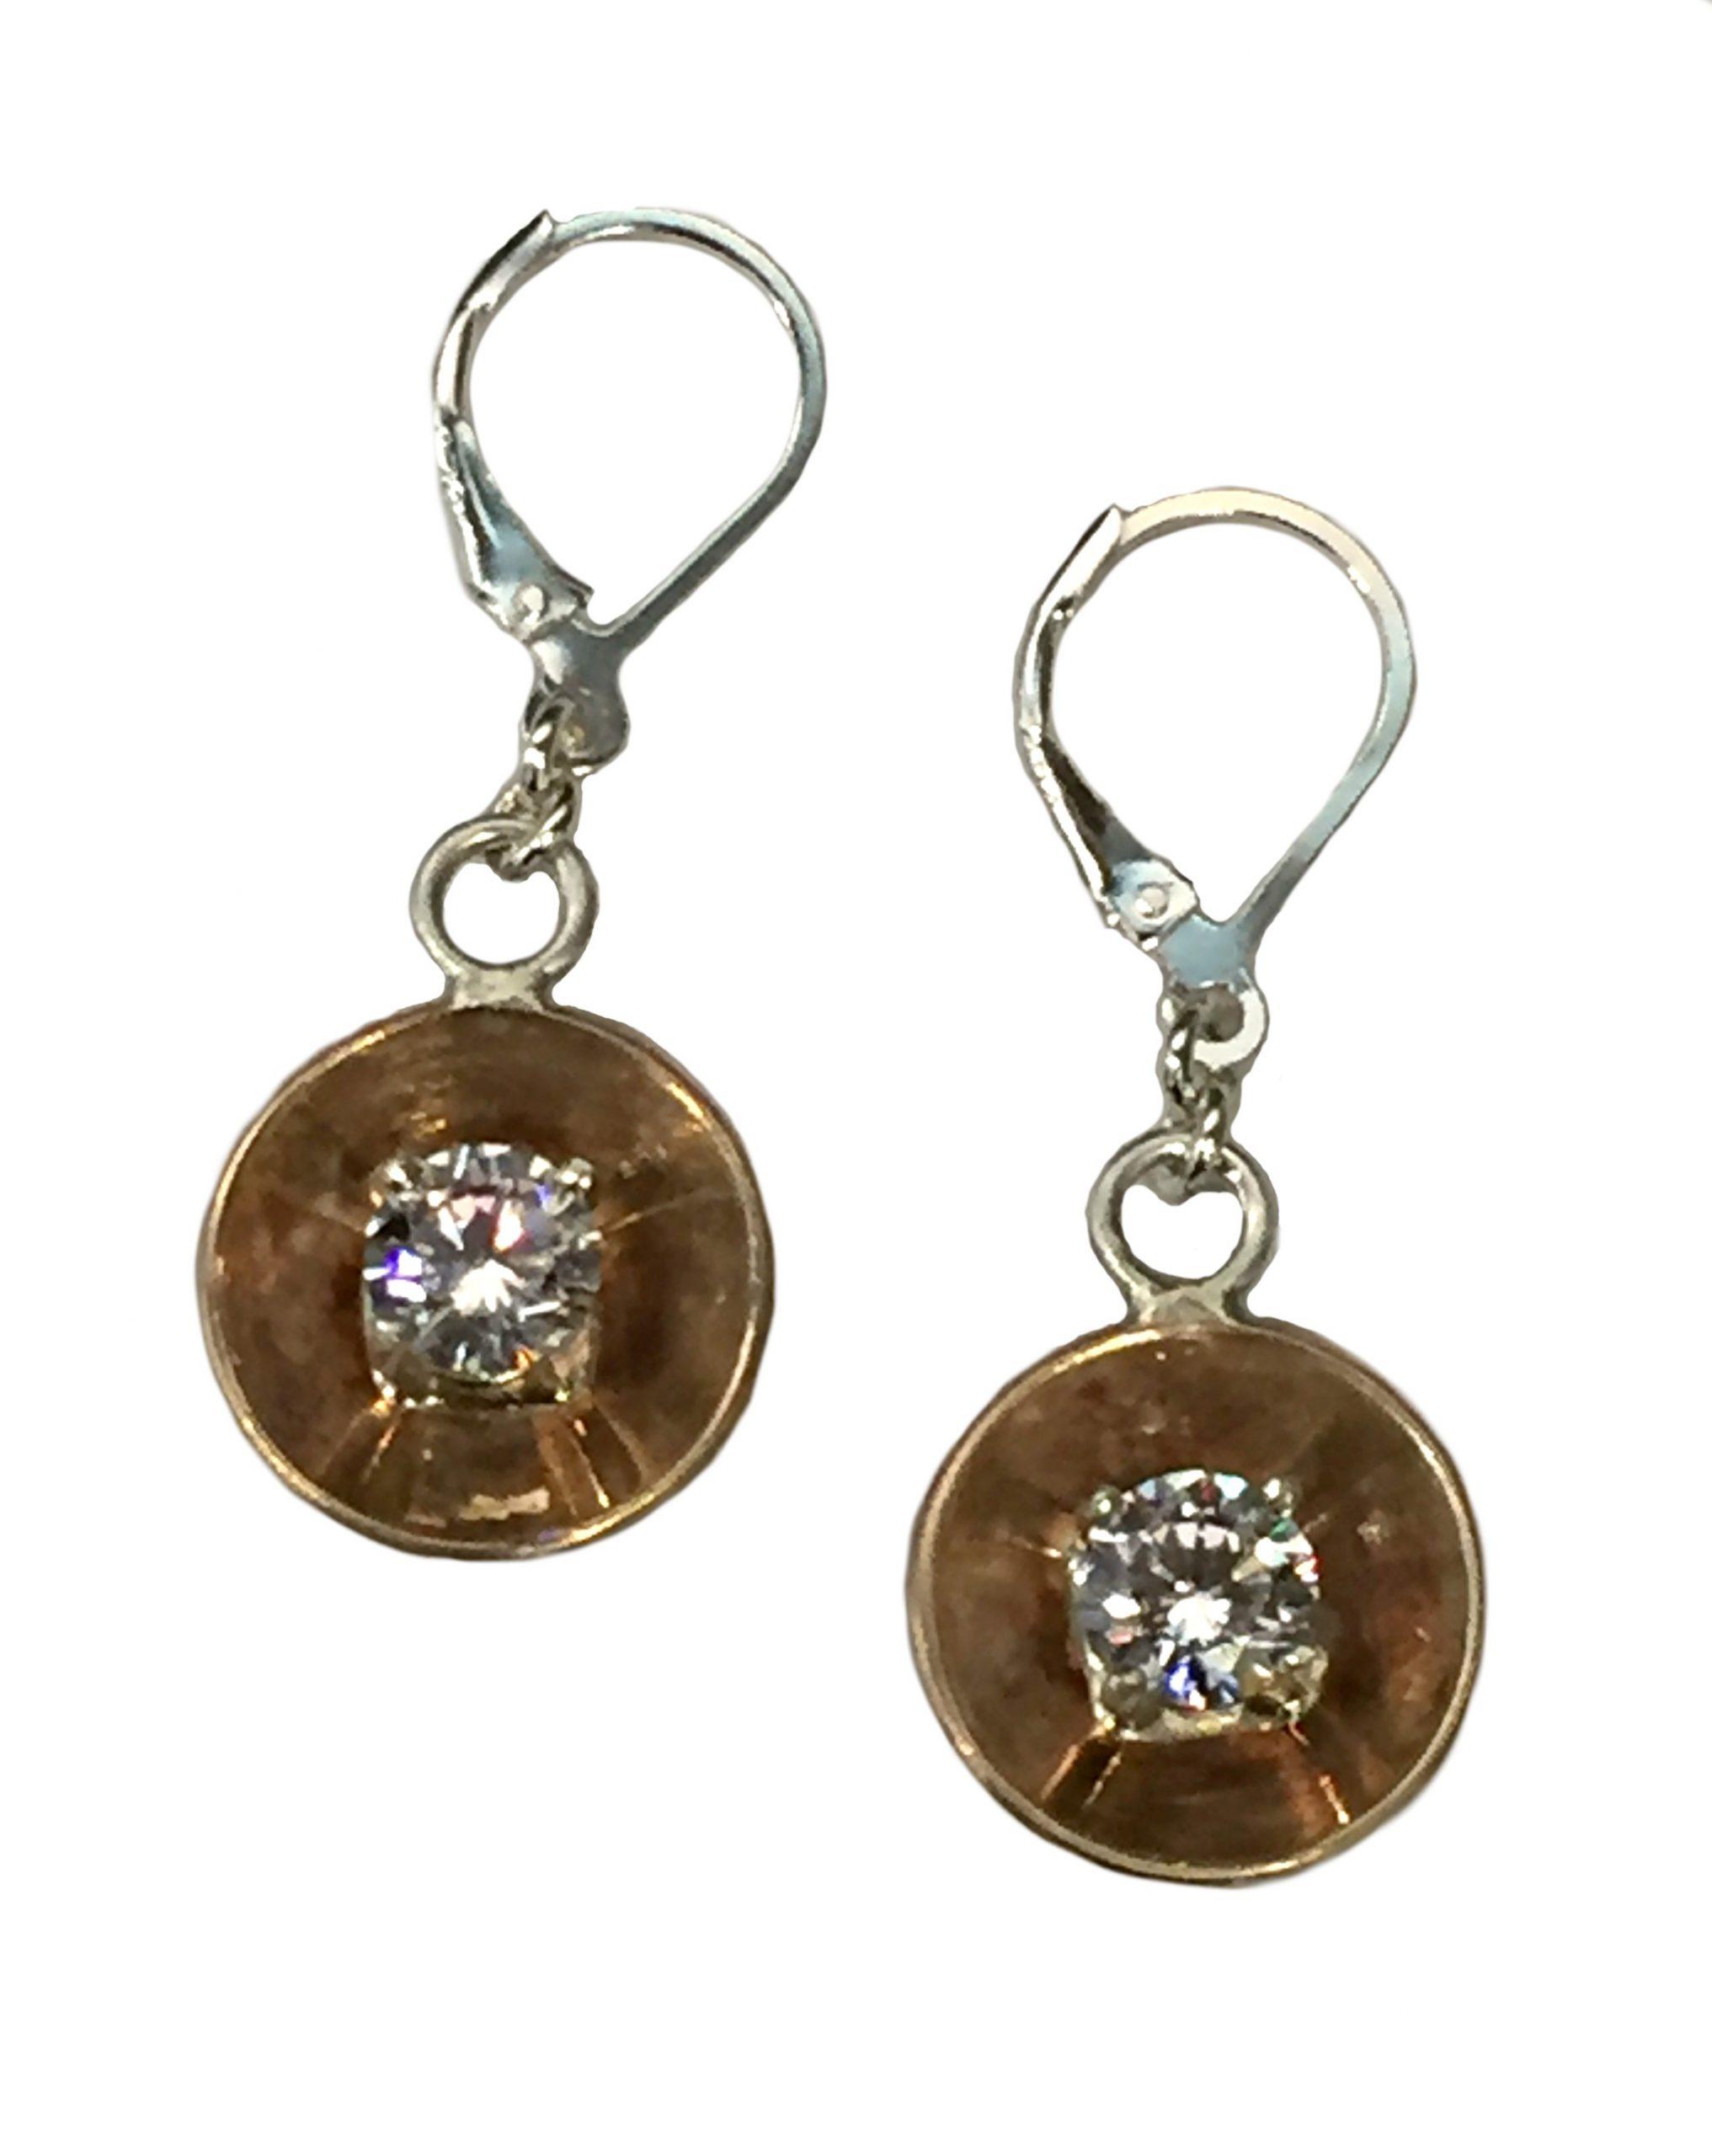 Bronze, Sterling Silver, + CZ Earrings by Karyn Chopik | Effusion Art Gallery + Cast Glass Studio, Invermere BC